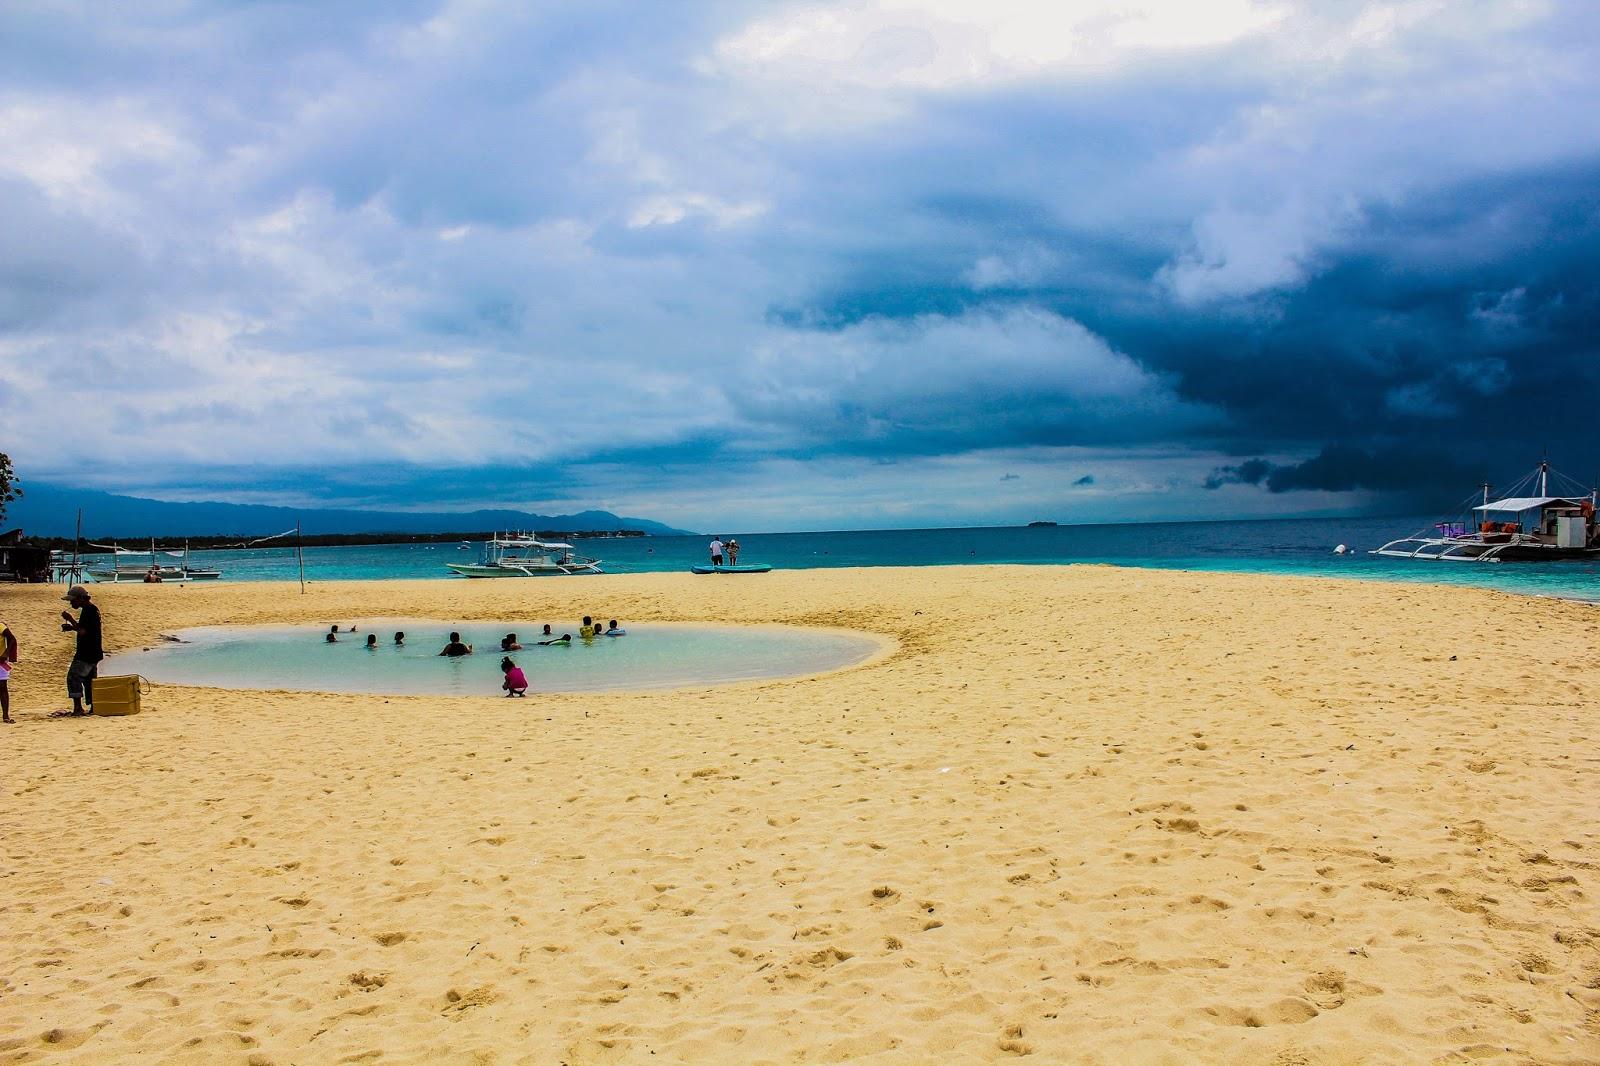 Iamkingyolo Things To Do In Moalboal Basdako Beach